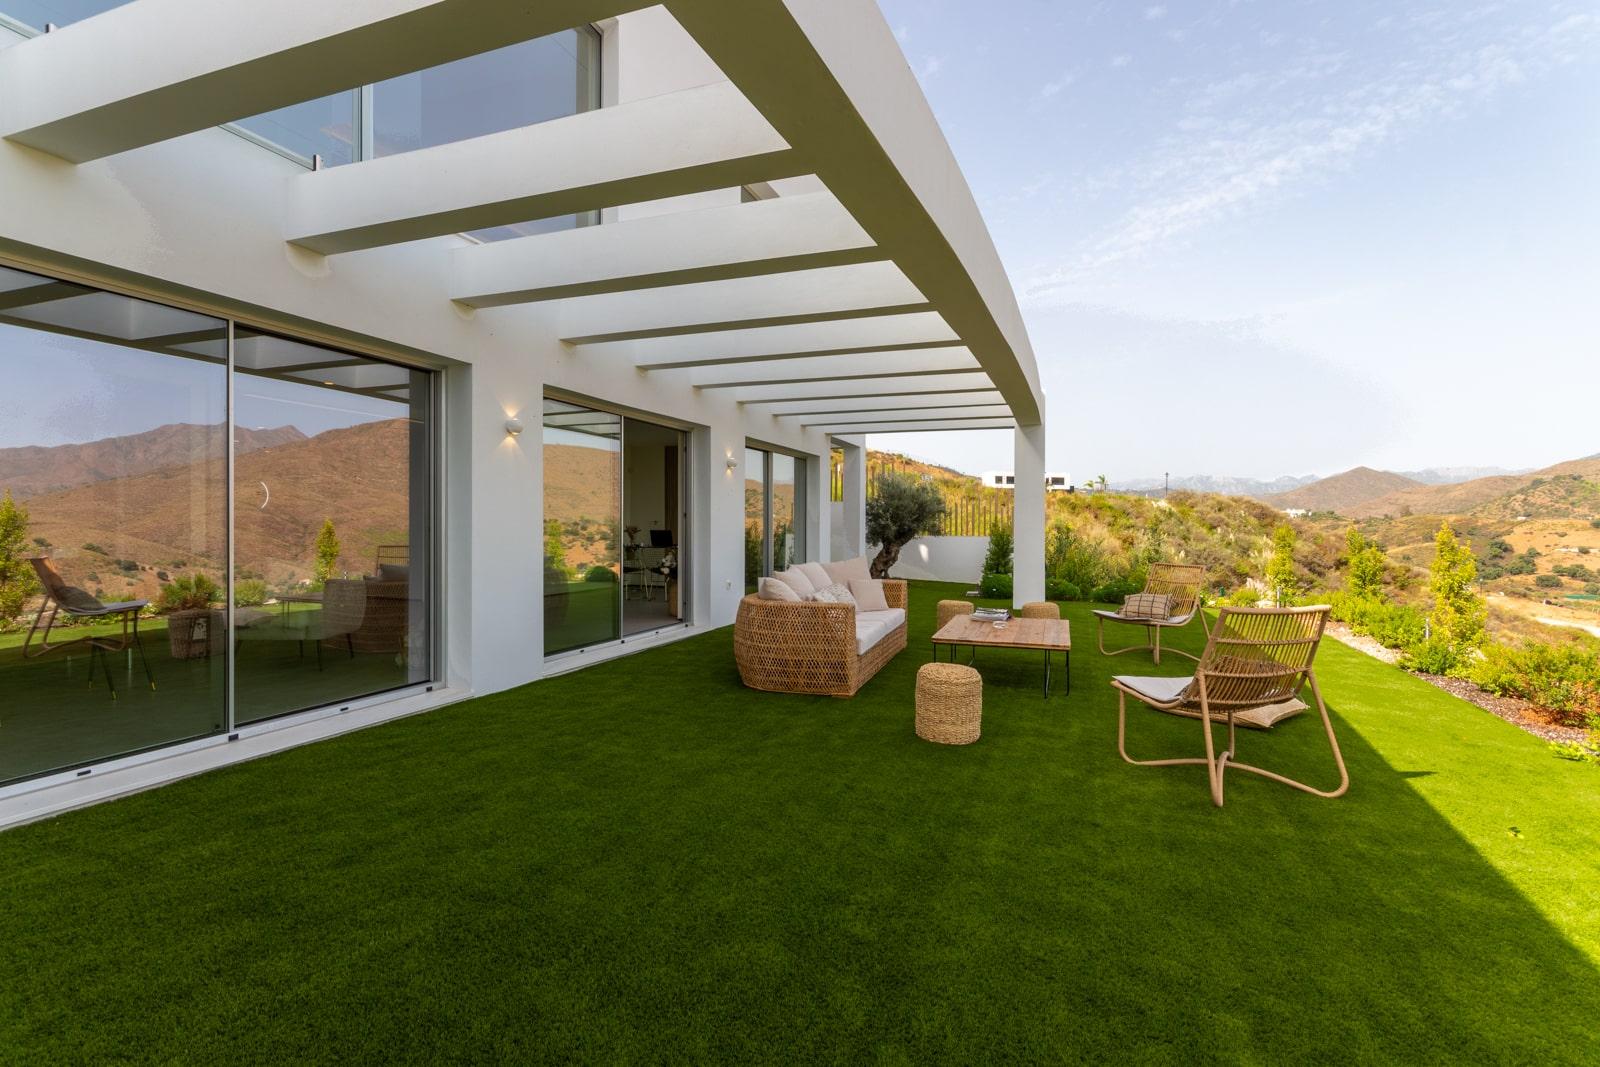 Villa con design moderno e tecnologia innovativa a Mijas Costa